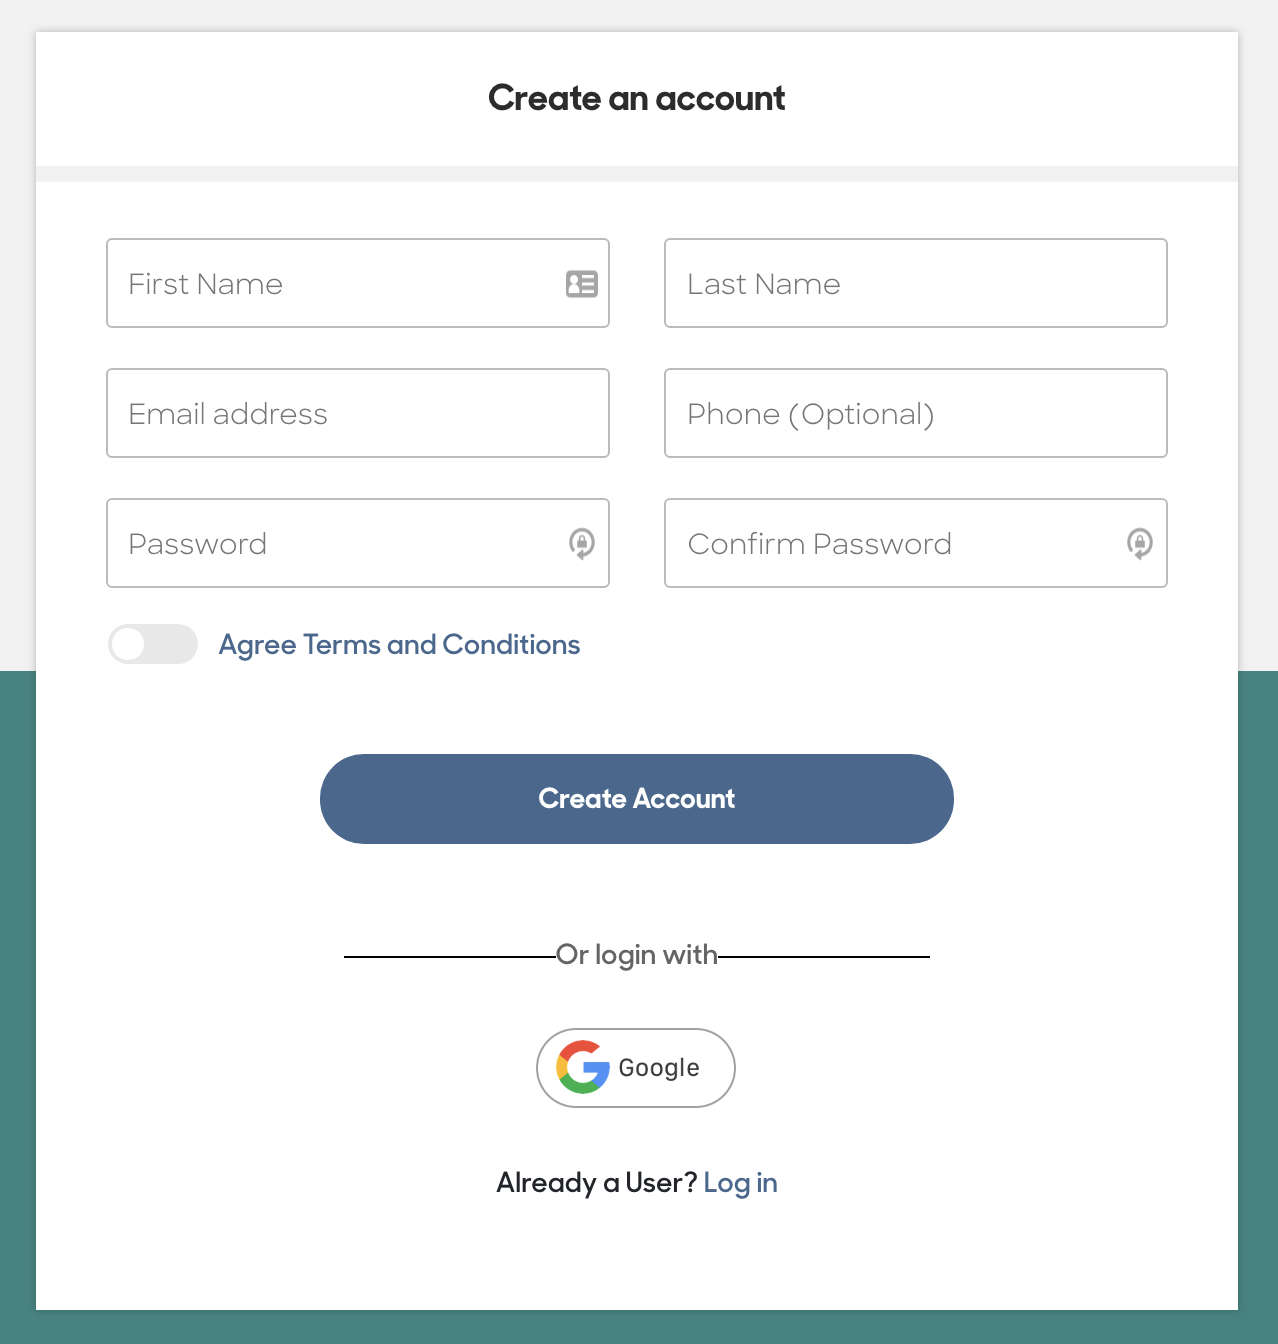 screenshot of creating Reach Mobile account